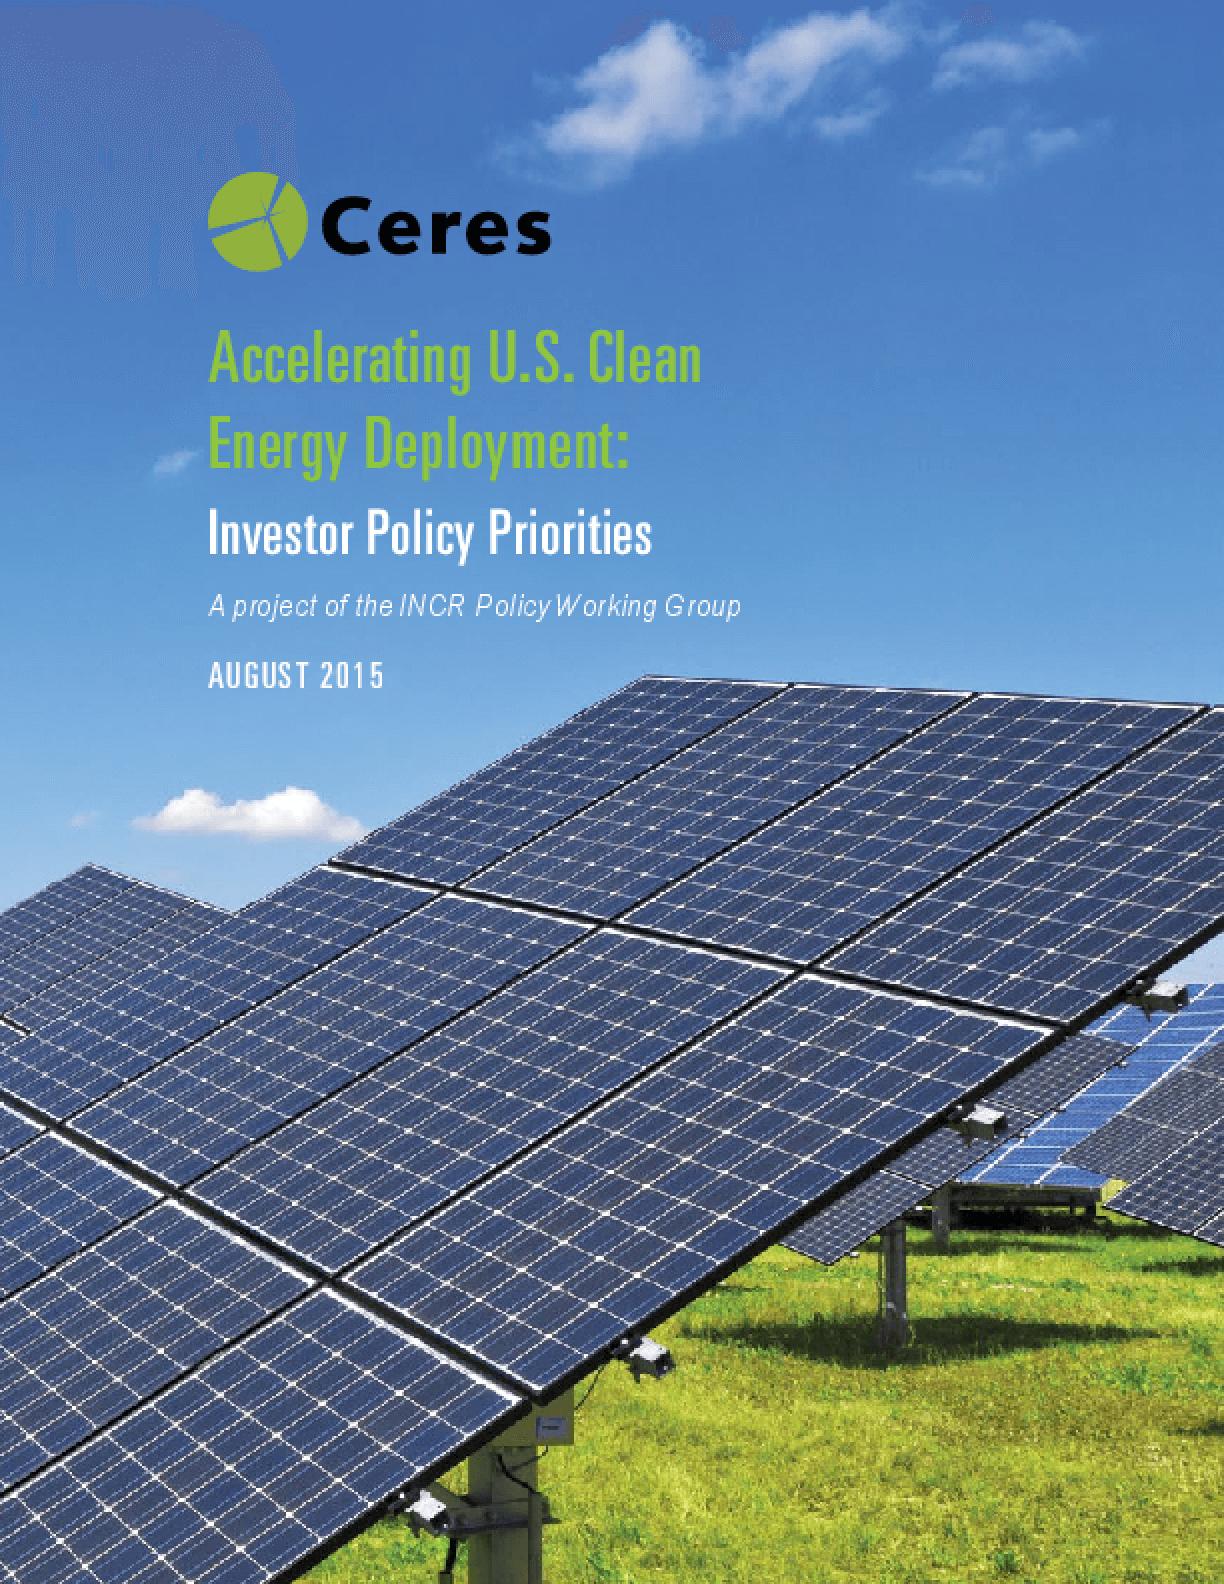 Accelerating U.S. Clean Energy Deployment: Investor Policy Priorities